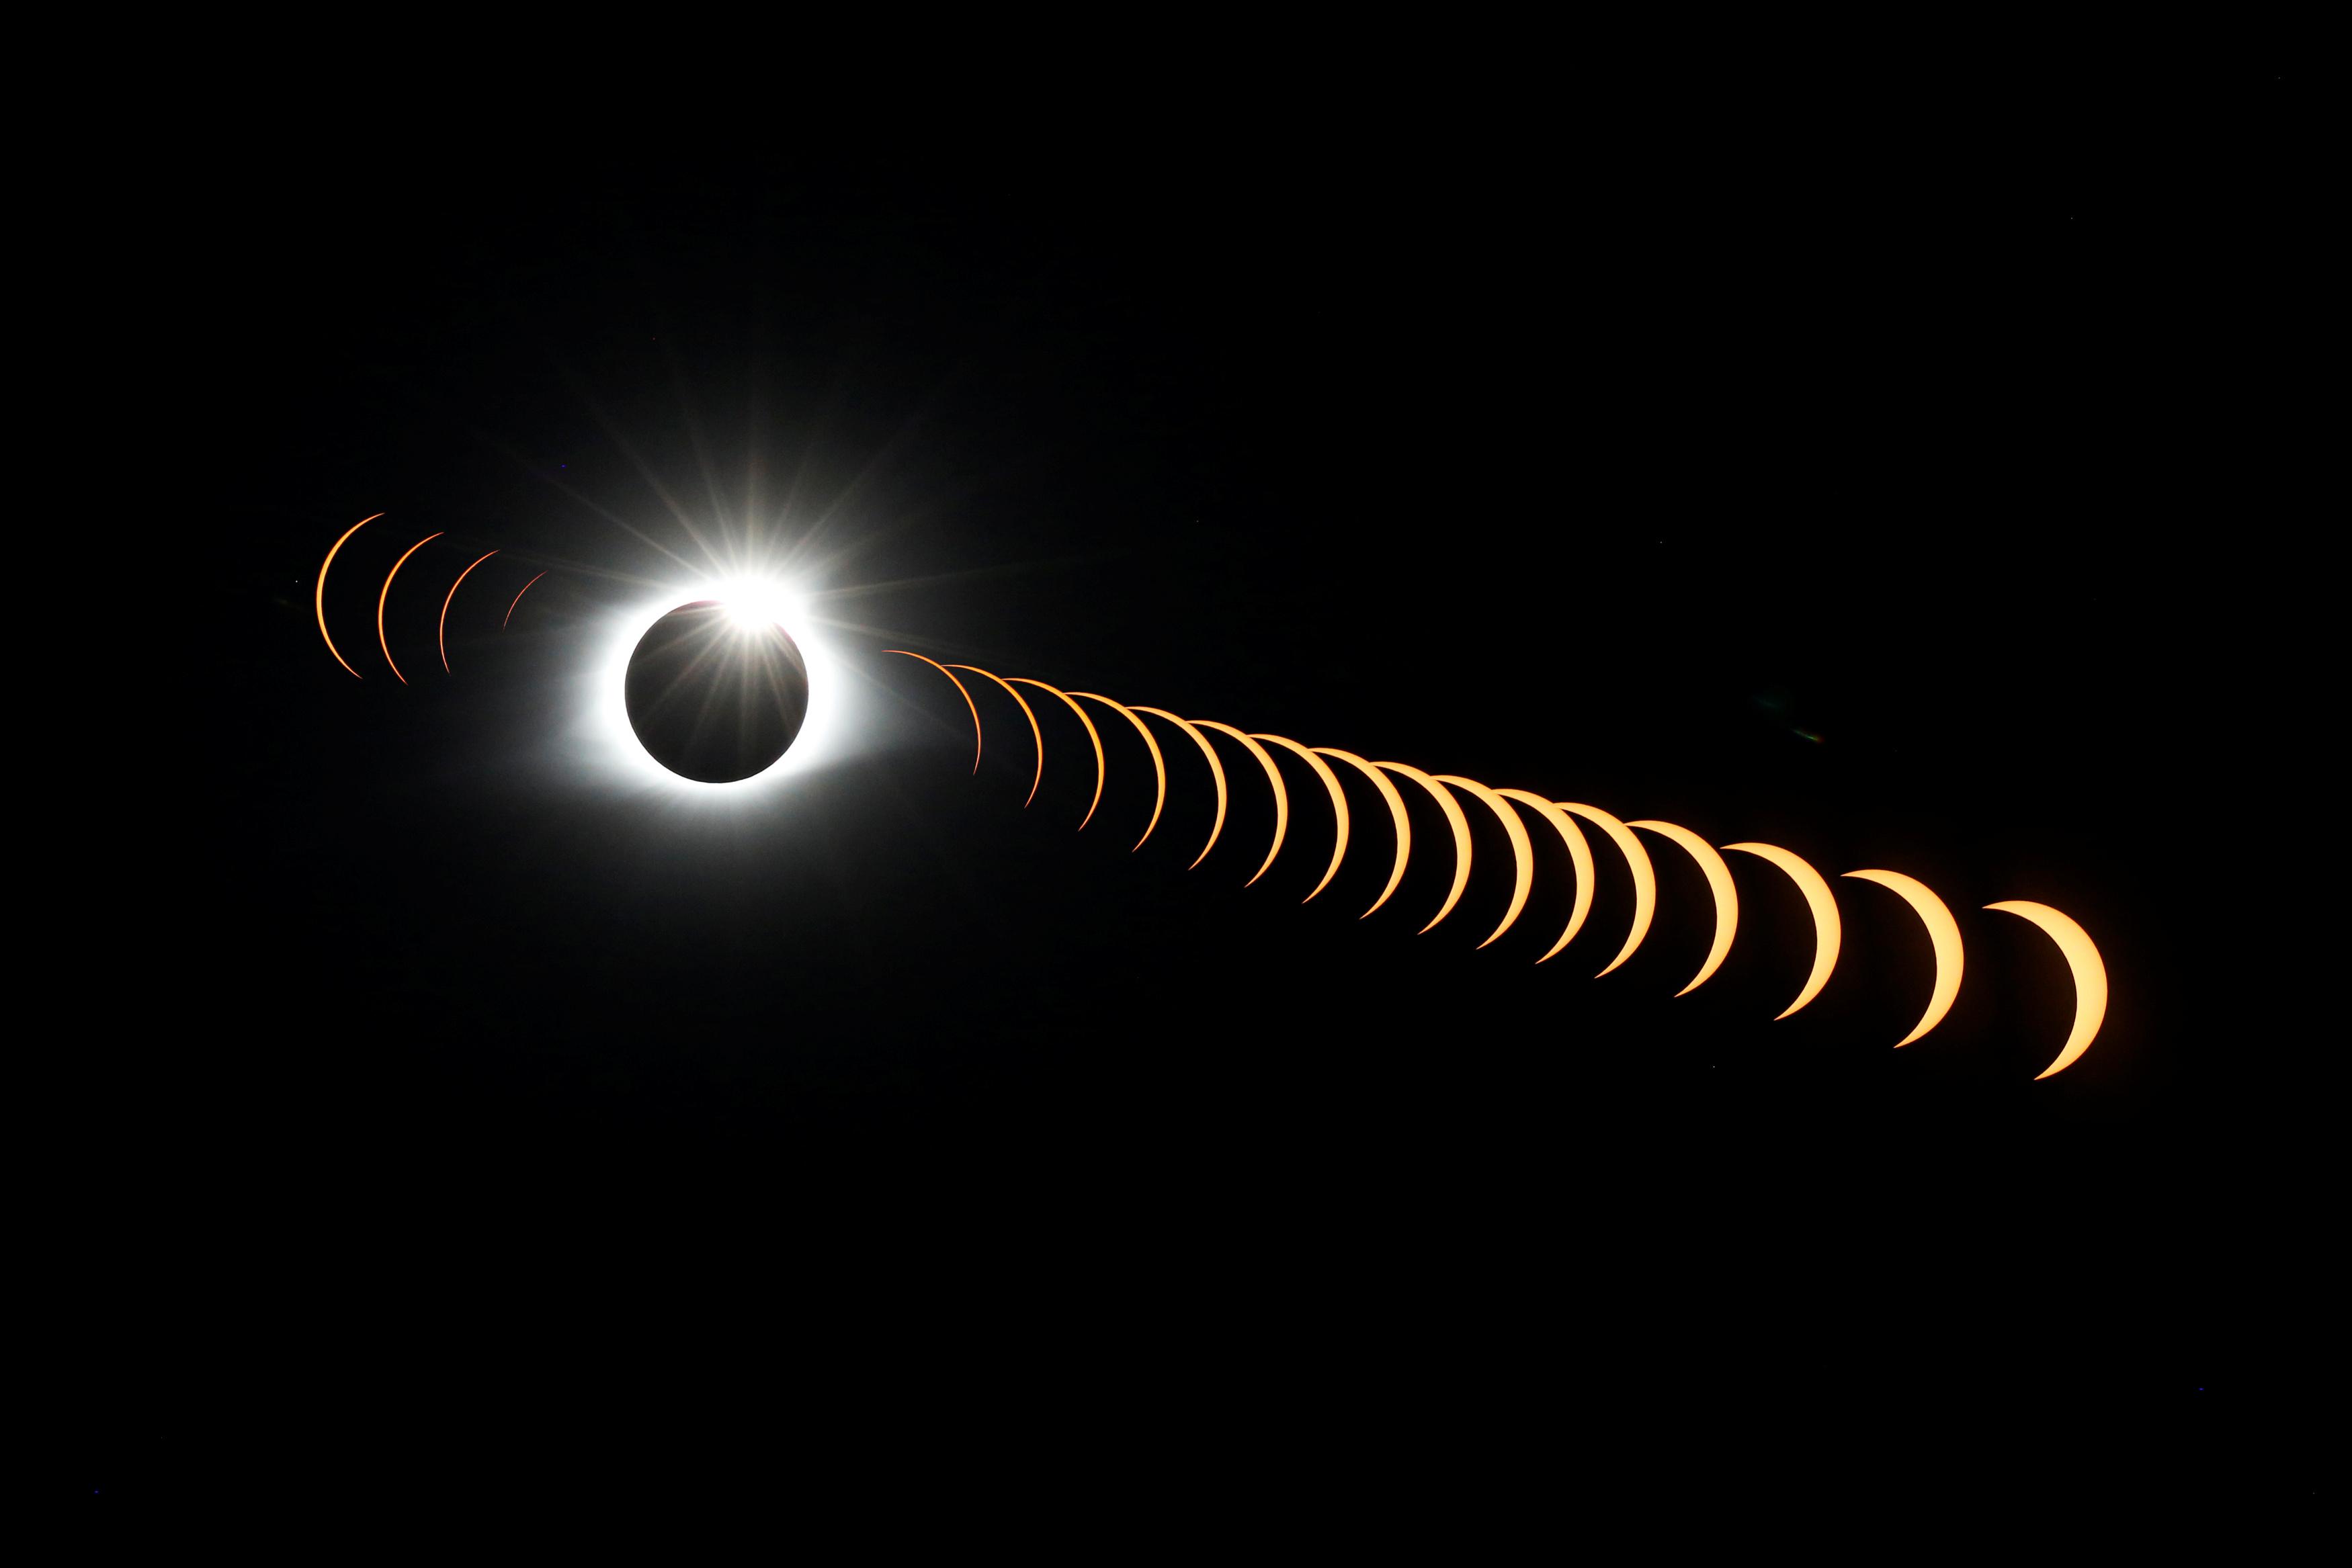 time-lapse eclipse photo